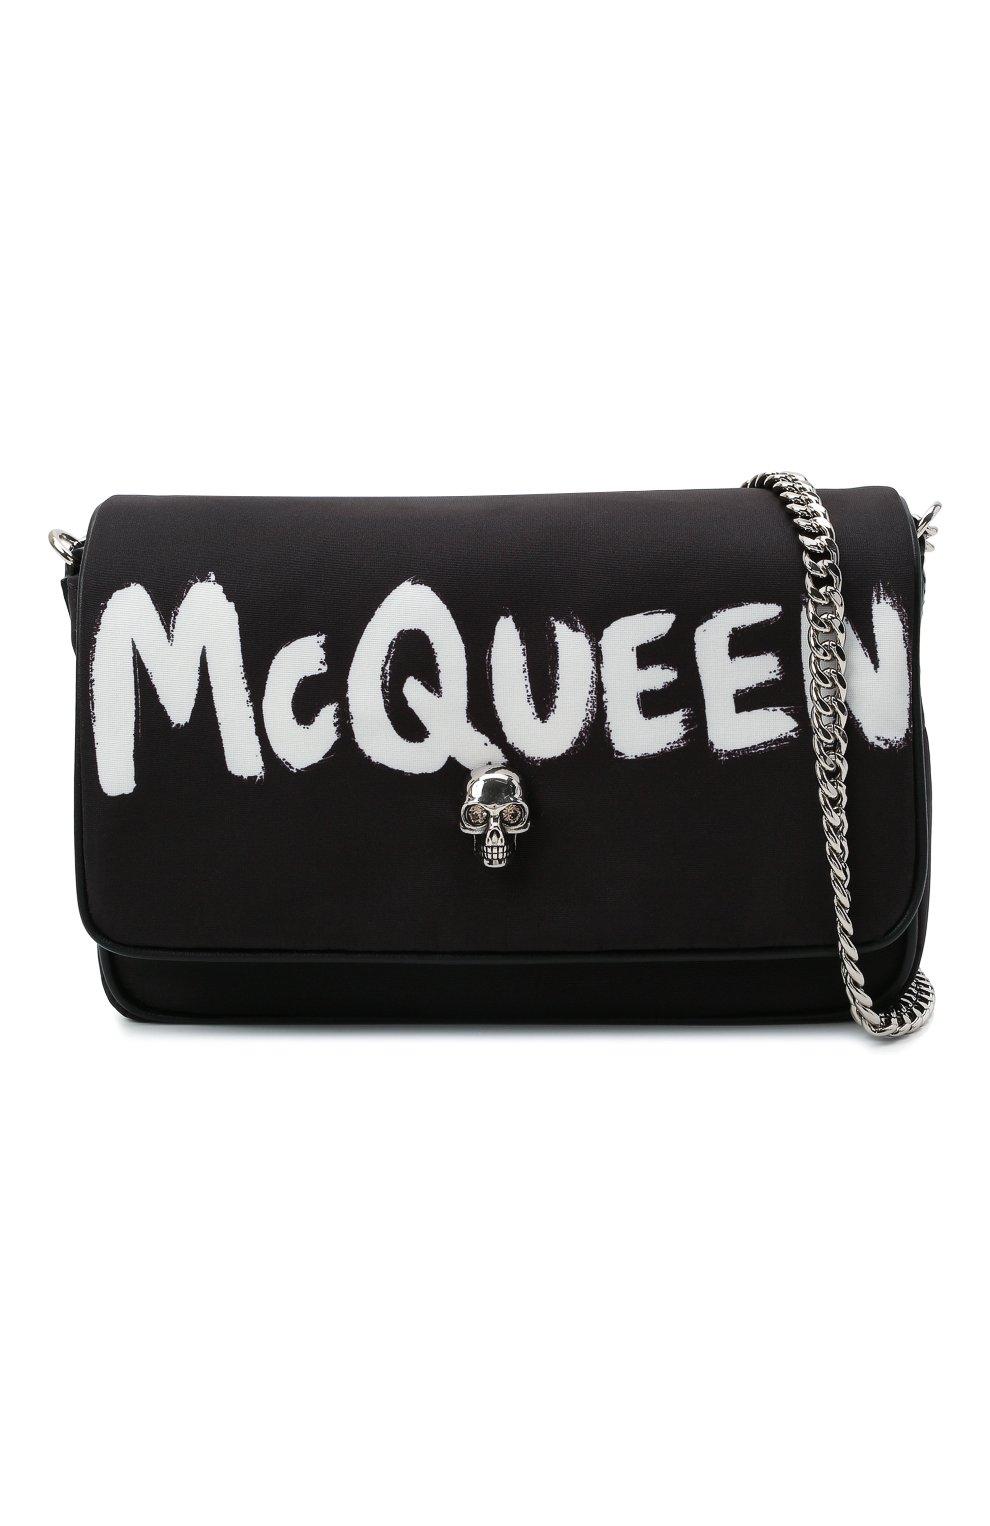 Женская сумка skull ALEXANDER MCQUEEN черного цвета, арт. 666120/16XAB | Фото 5 (Сумки-технические: Сумки через плечо; Размер: mini; Ремень/цепочка: На ремешке; Материал: Текстиль)